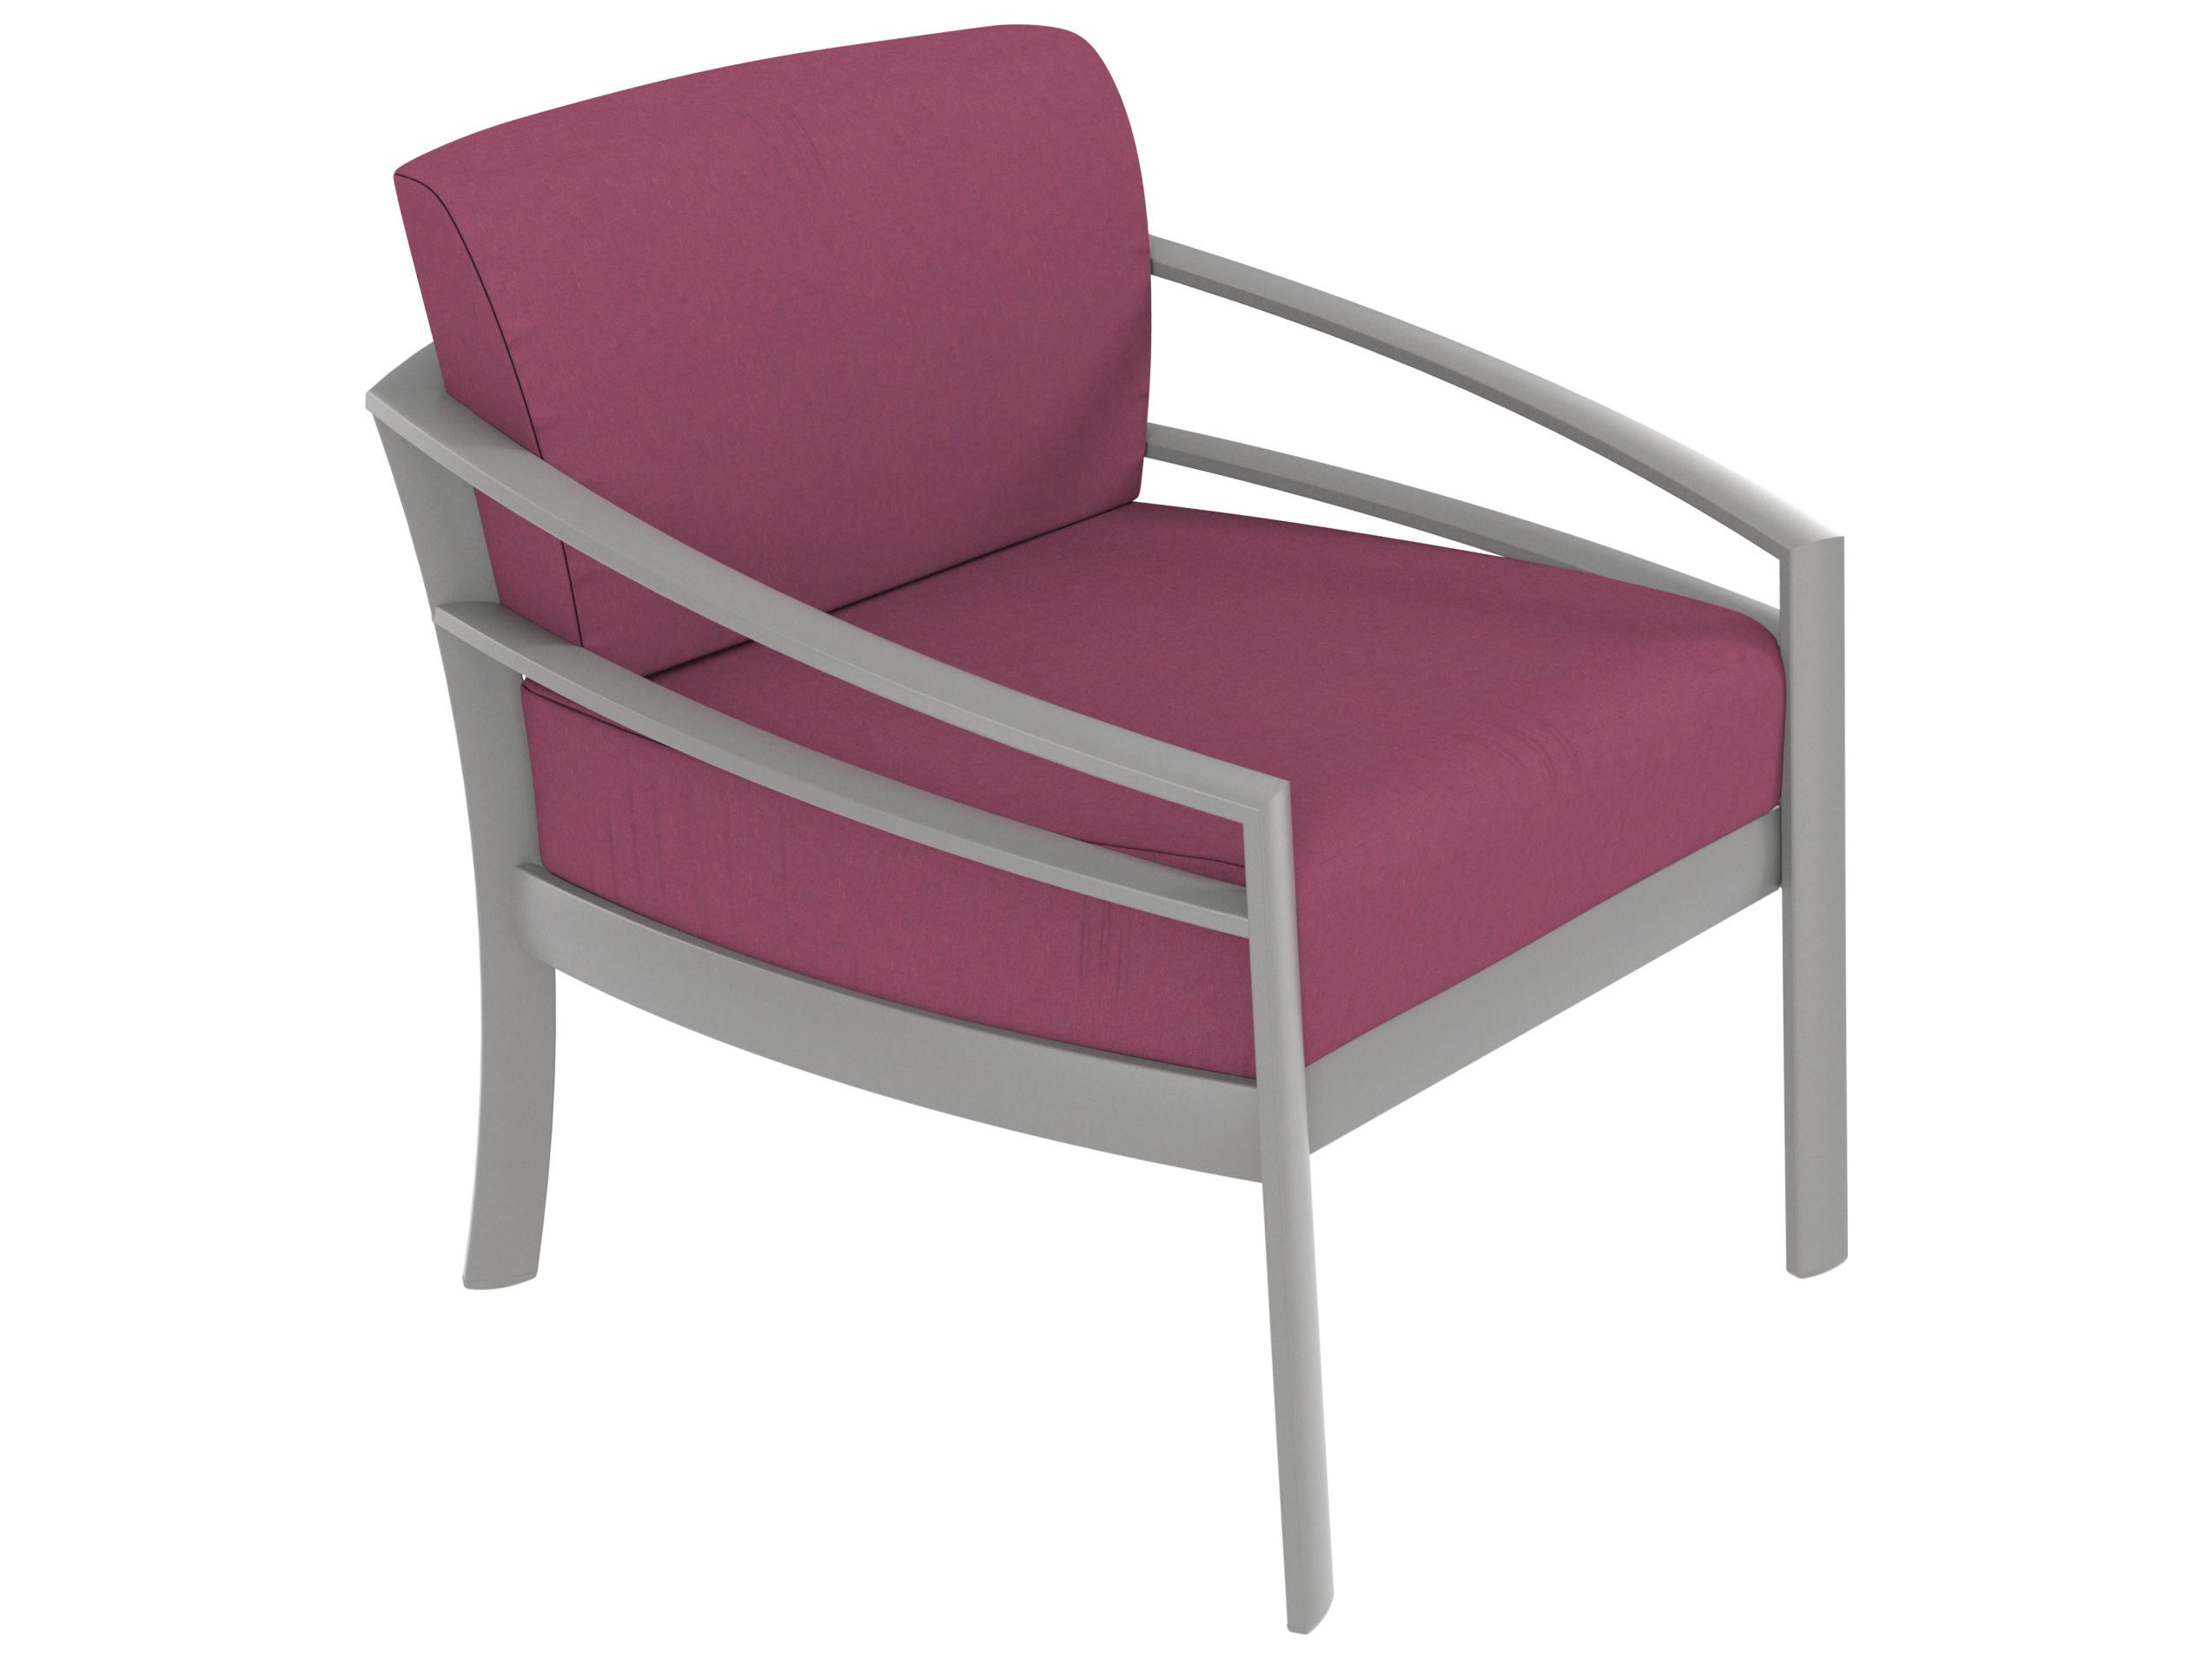 tropitone kor cushion aluminum sectional lounge set korsecset5. Black Bedroom Furniture Sets. Home Design Ideas